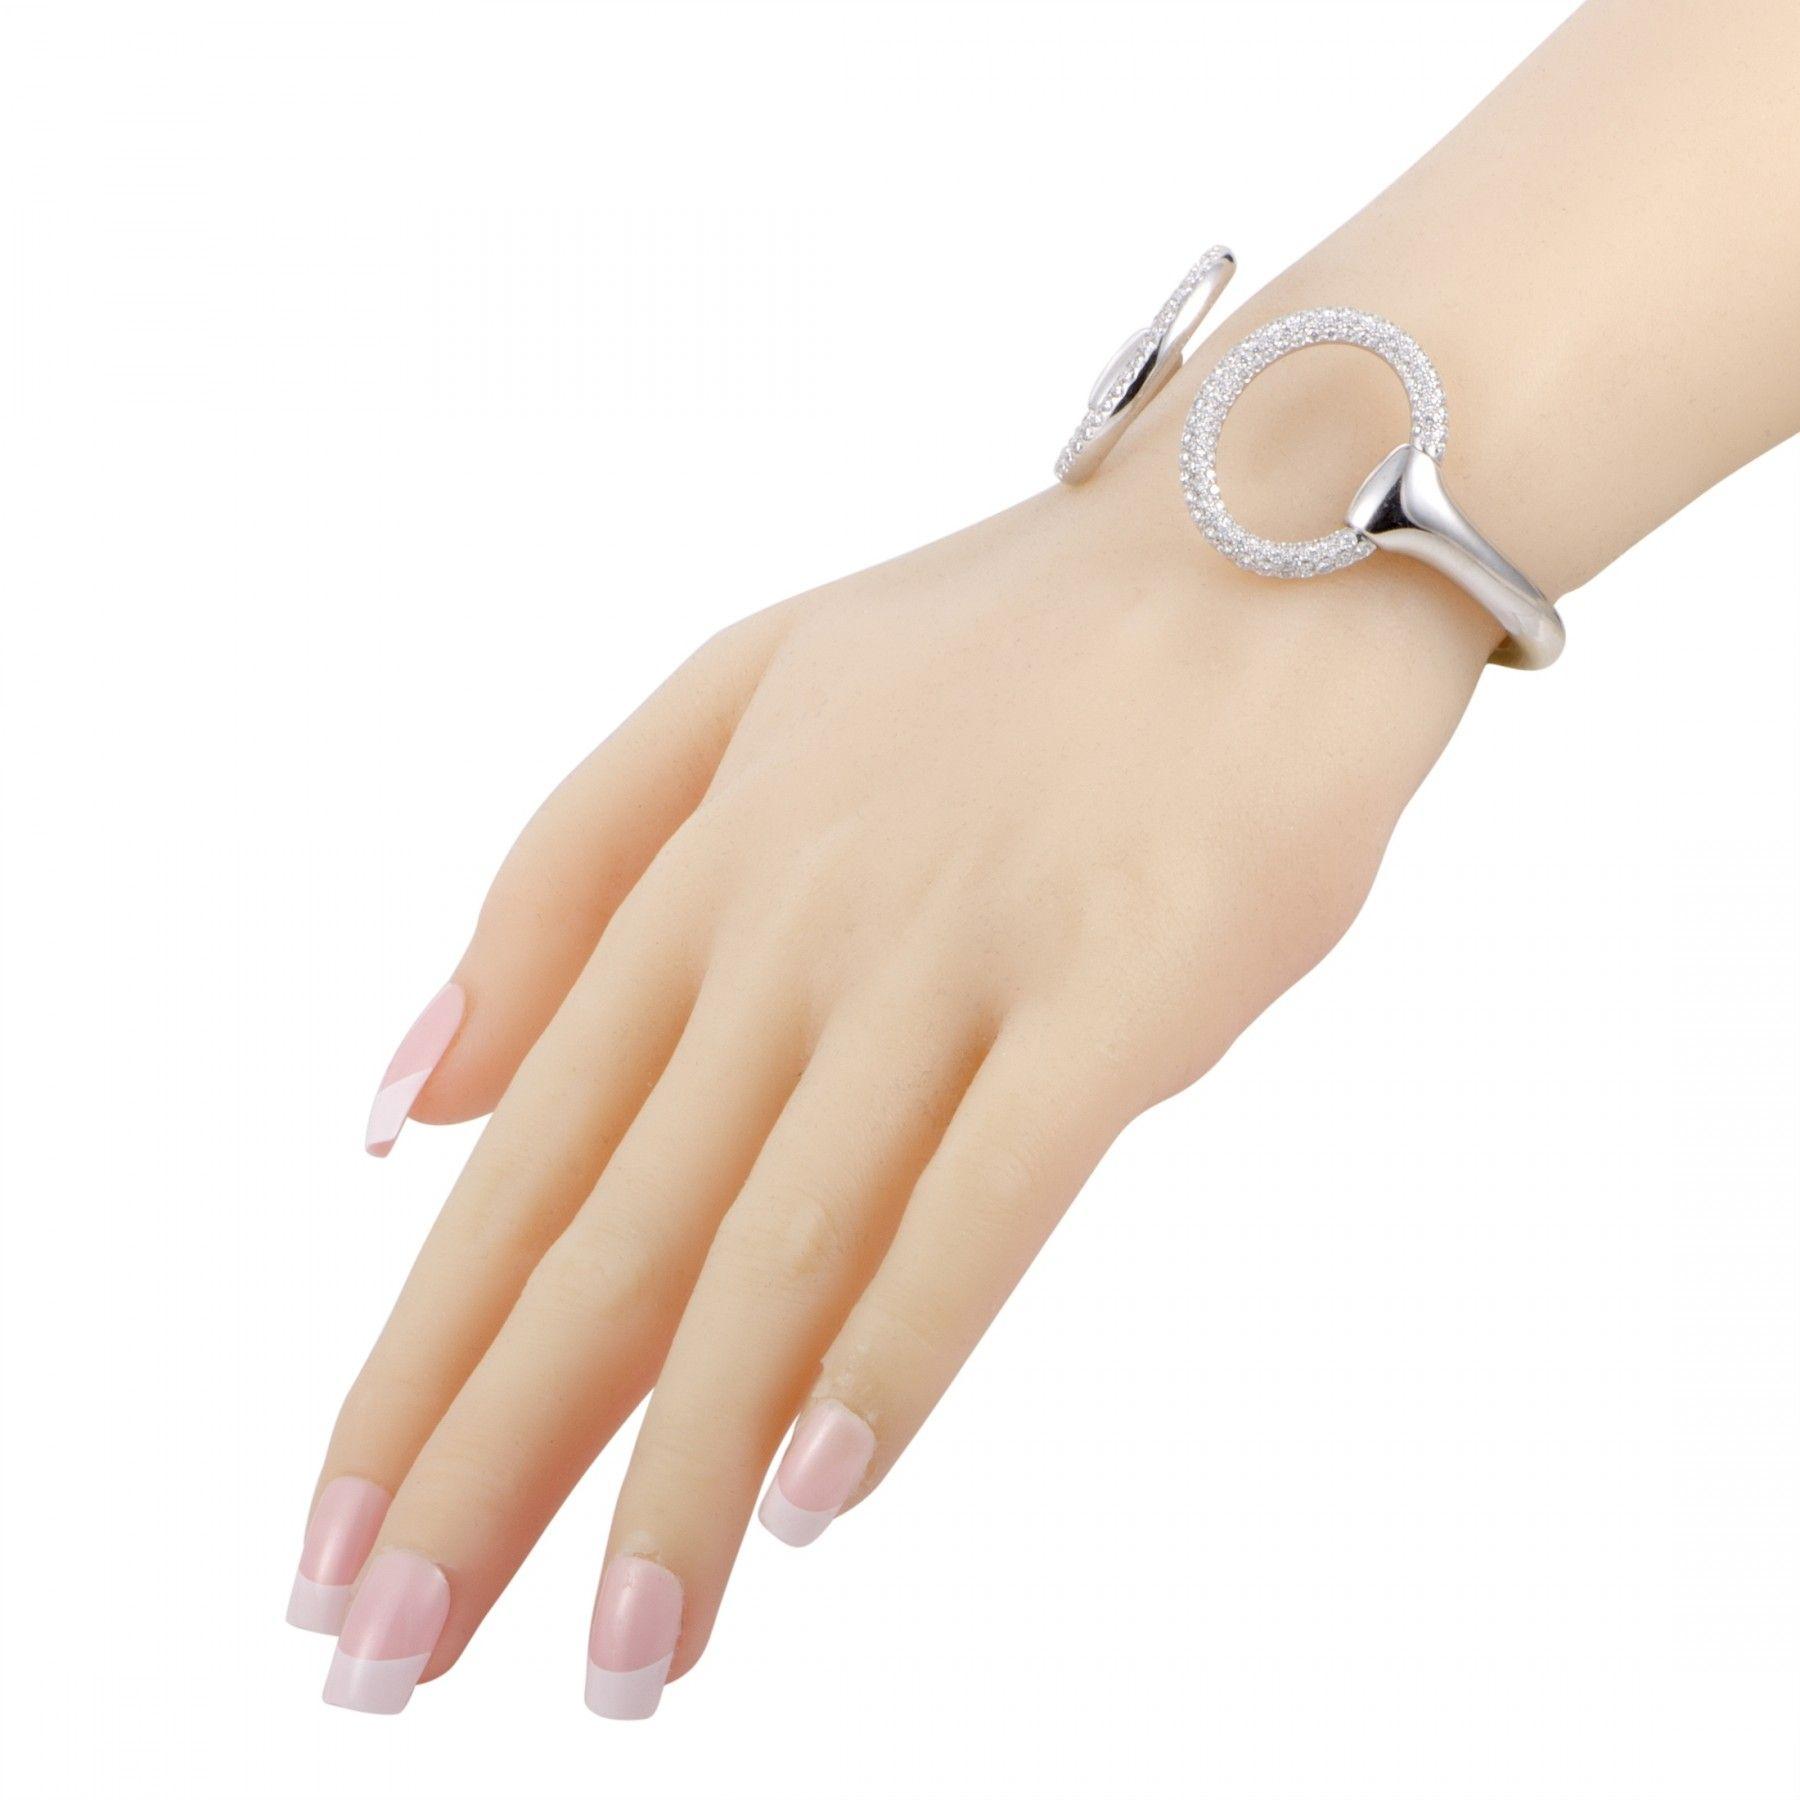 ... real hermès nausicaa 18k white gold diamond pave horsebit open bangle  bracelet small model 0ee2a 2c66f 5dcab1dd36e